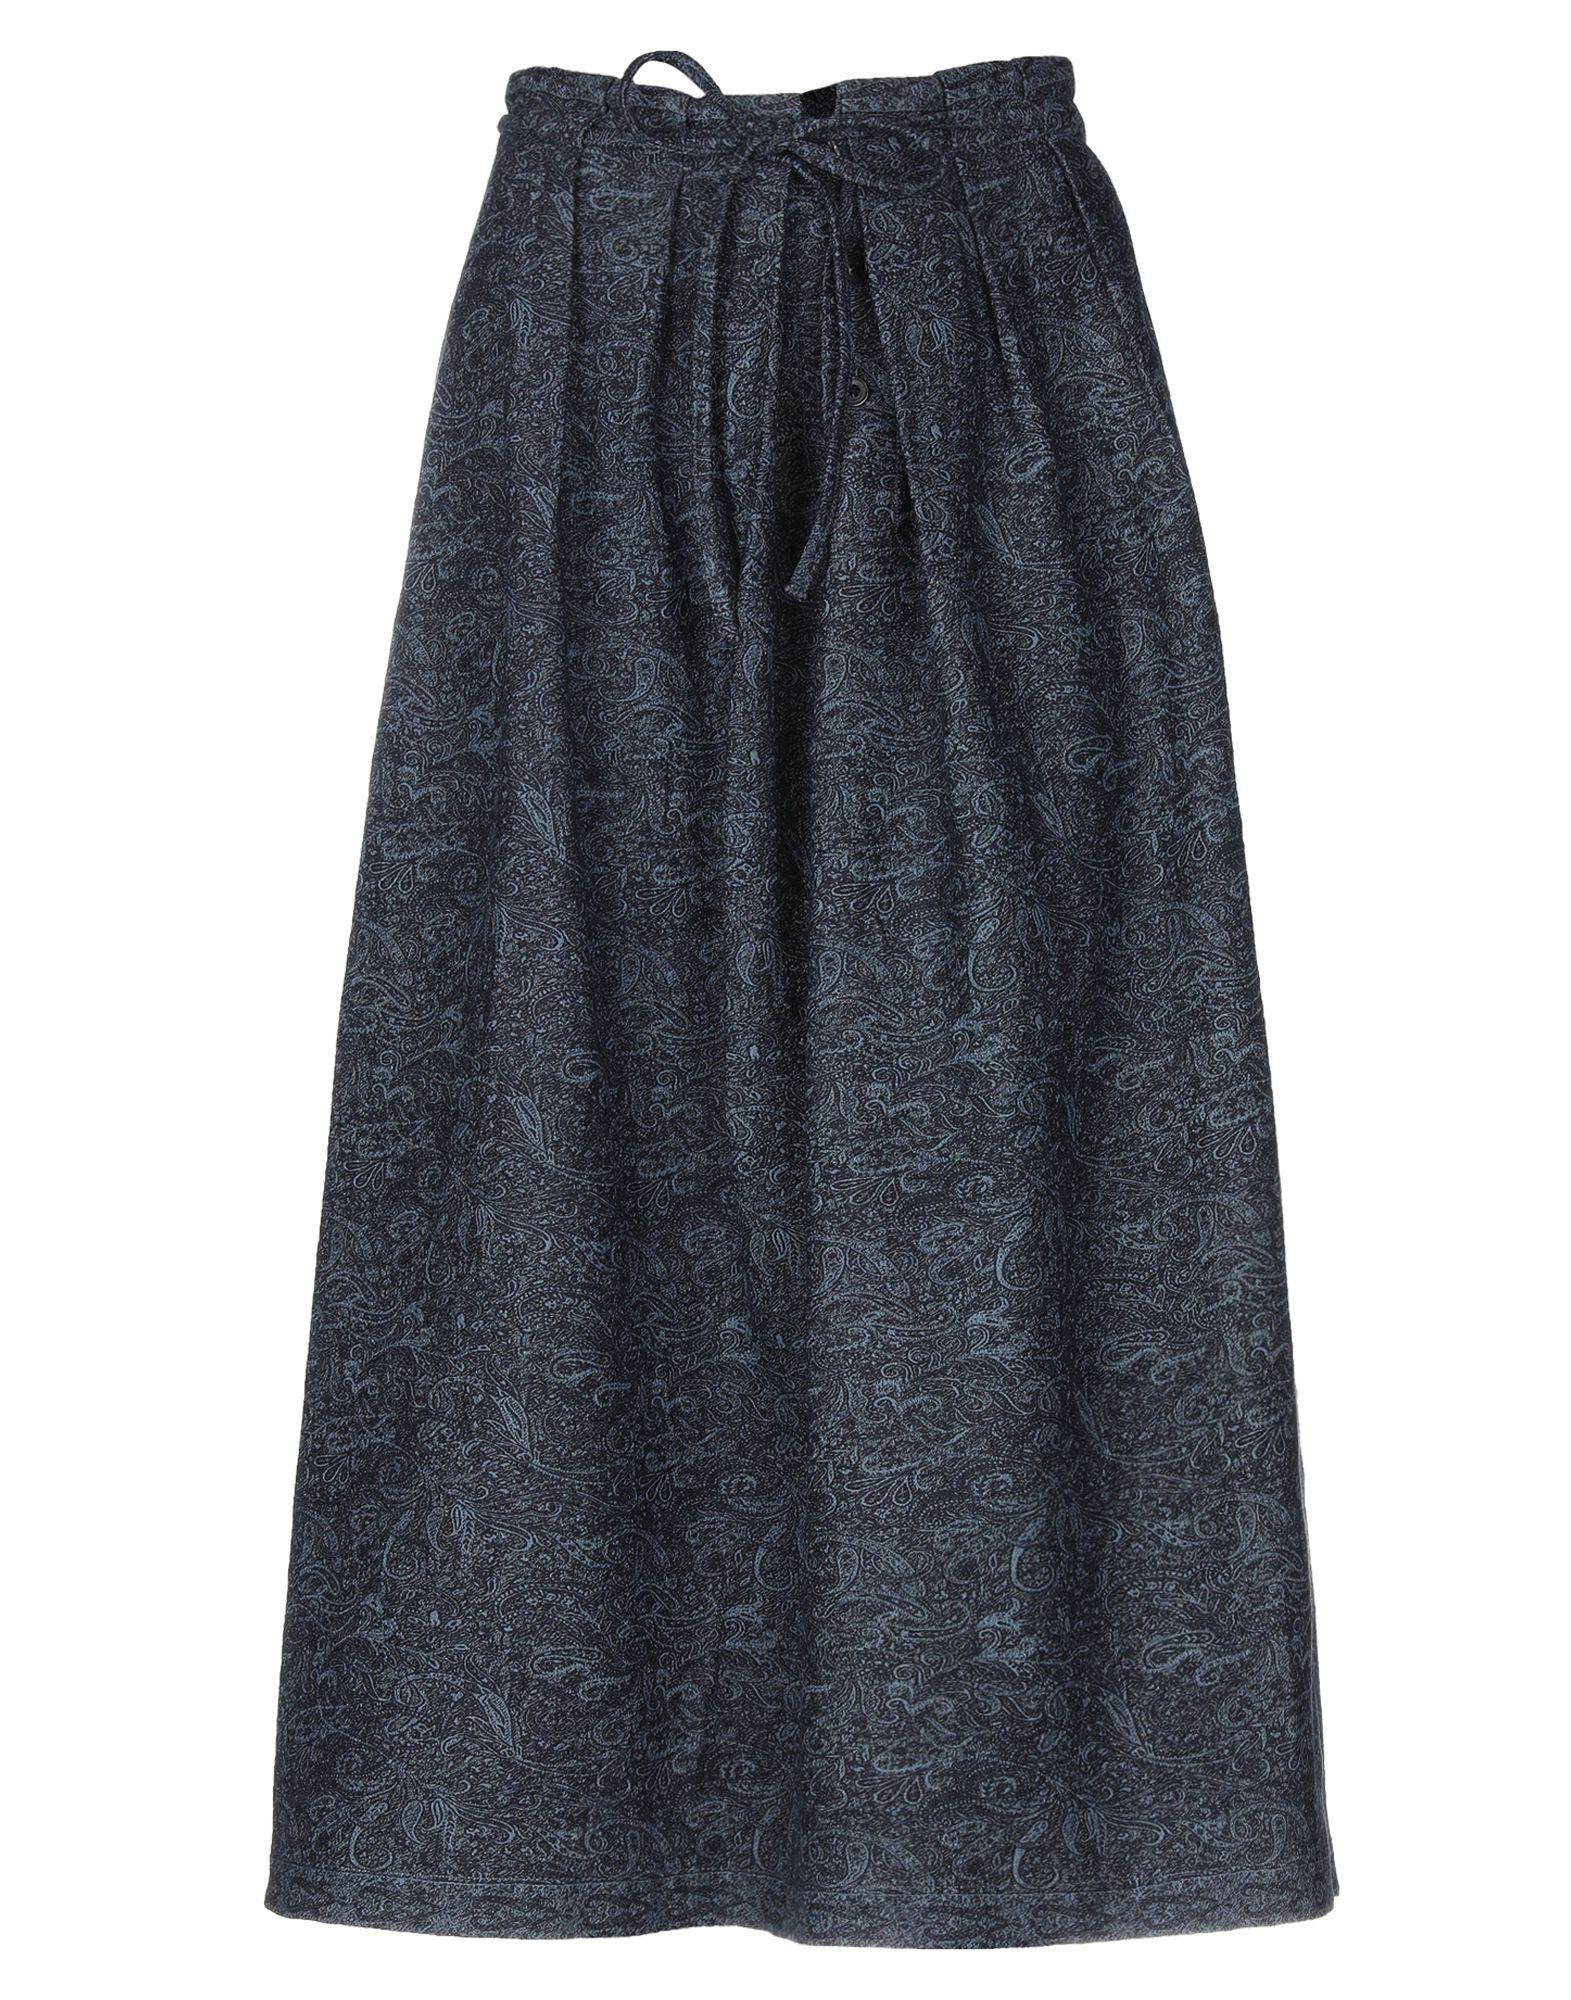 KHADI AND CO. Юбка длиной 3/4 co юбка длиной 3 4